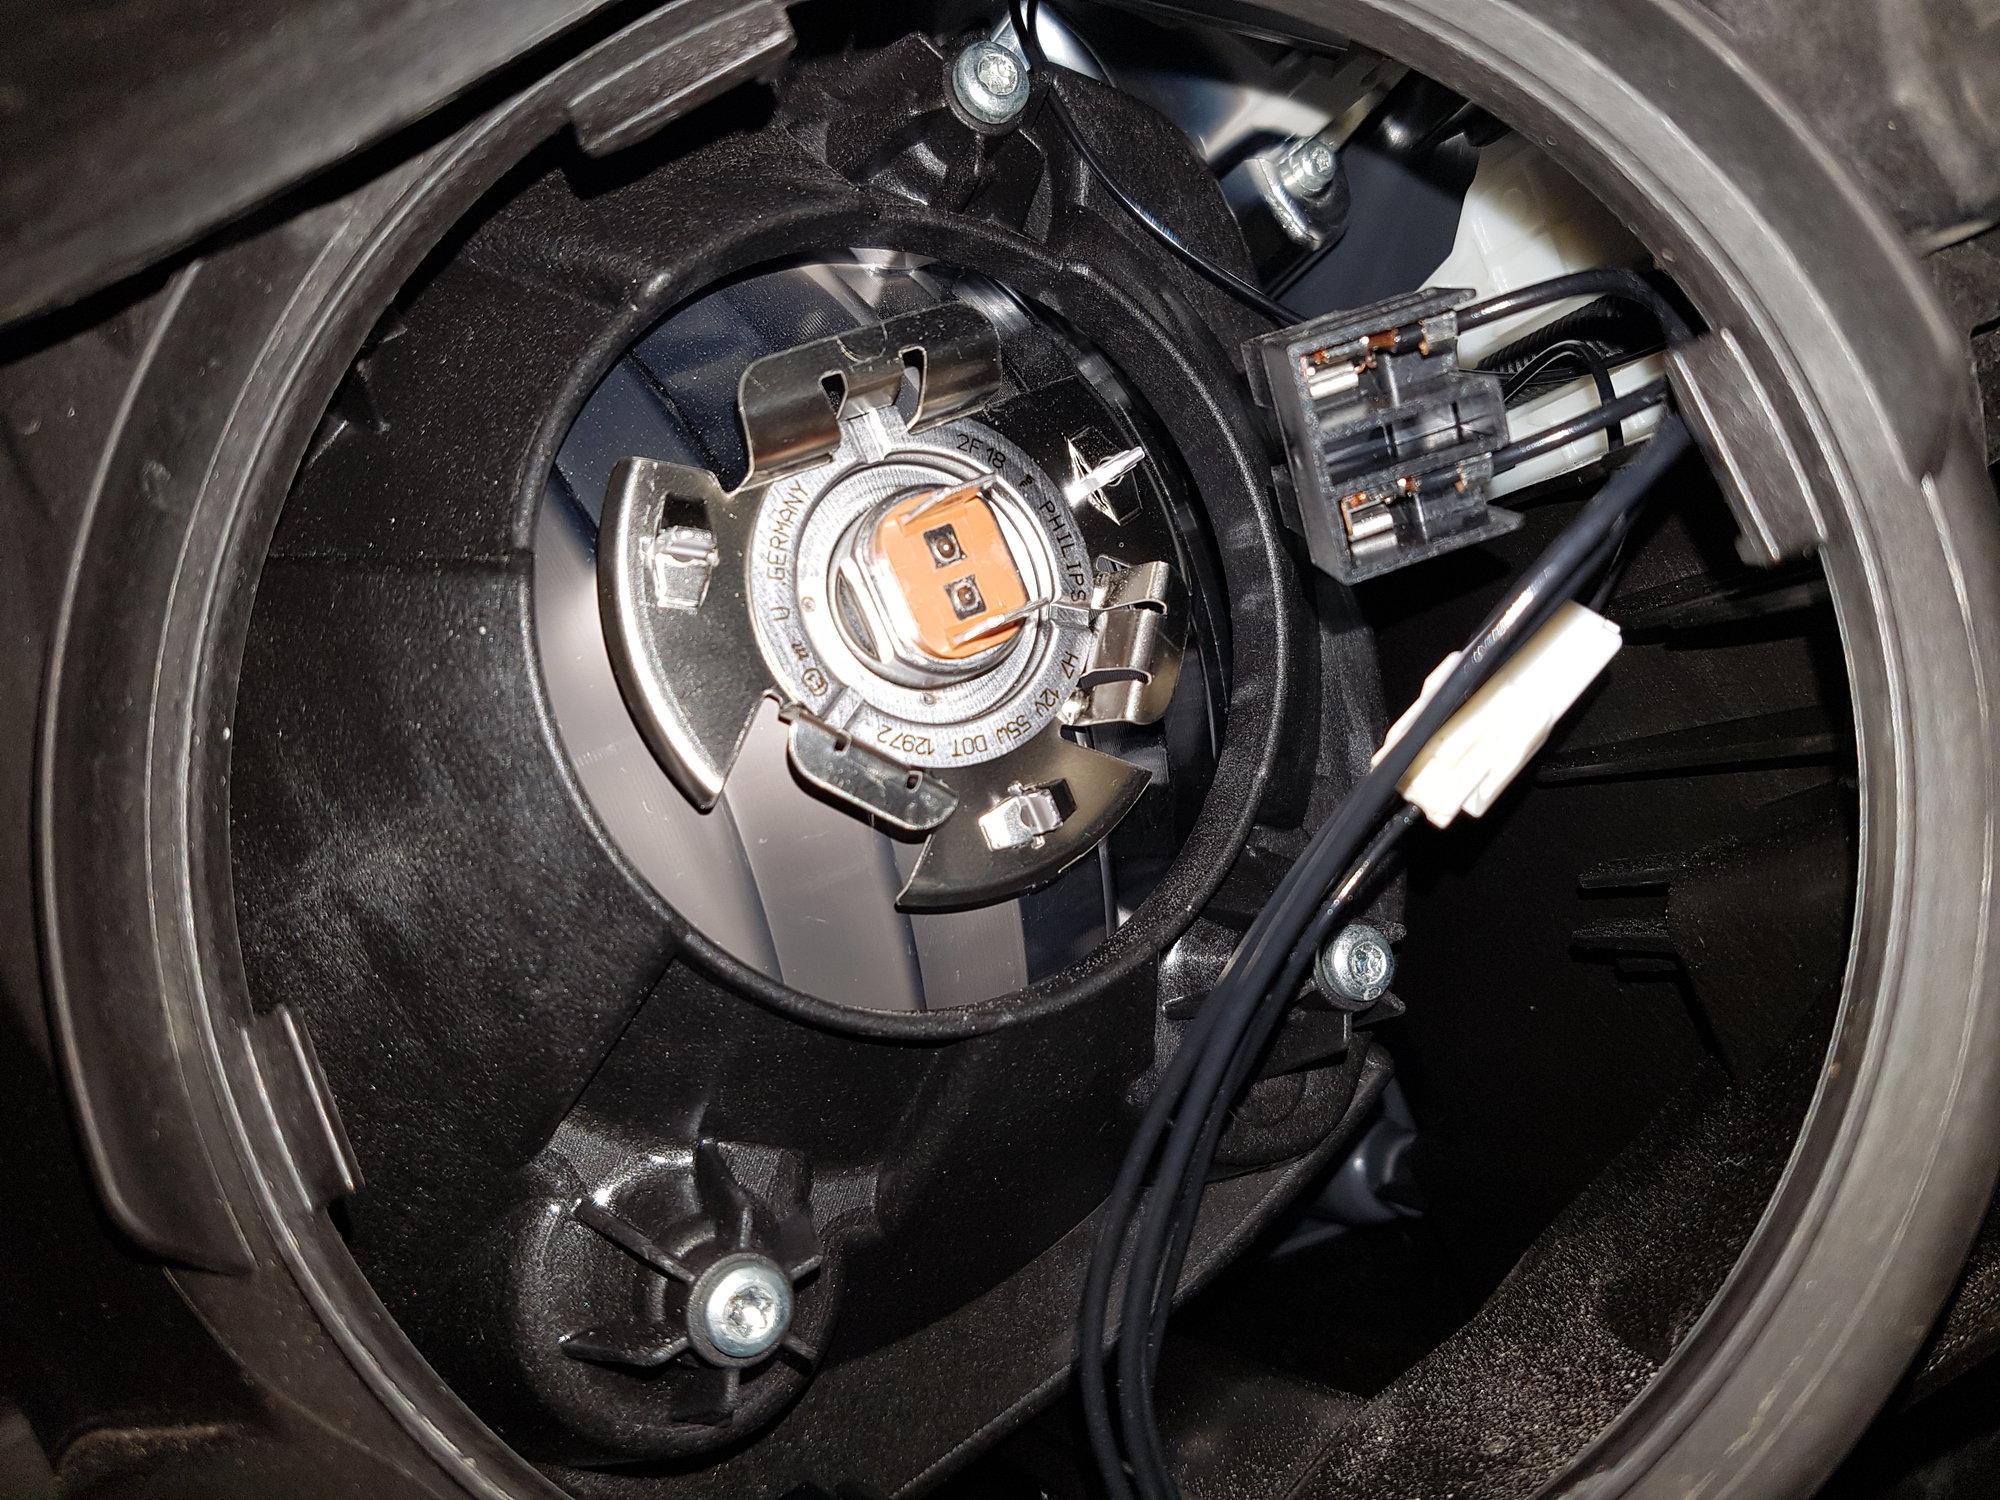 2013 GLK 350 Low beam headlamp replacement - MBWorld org Forums